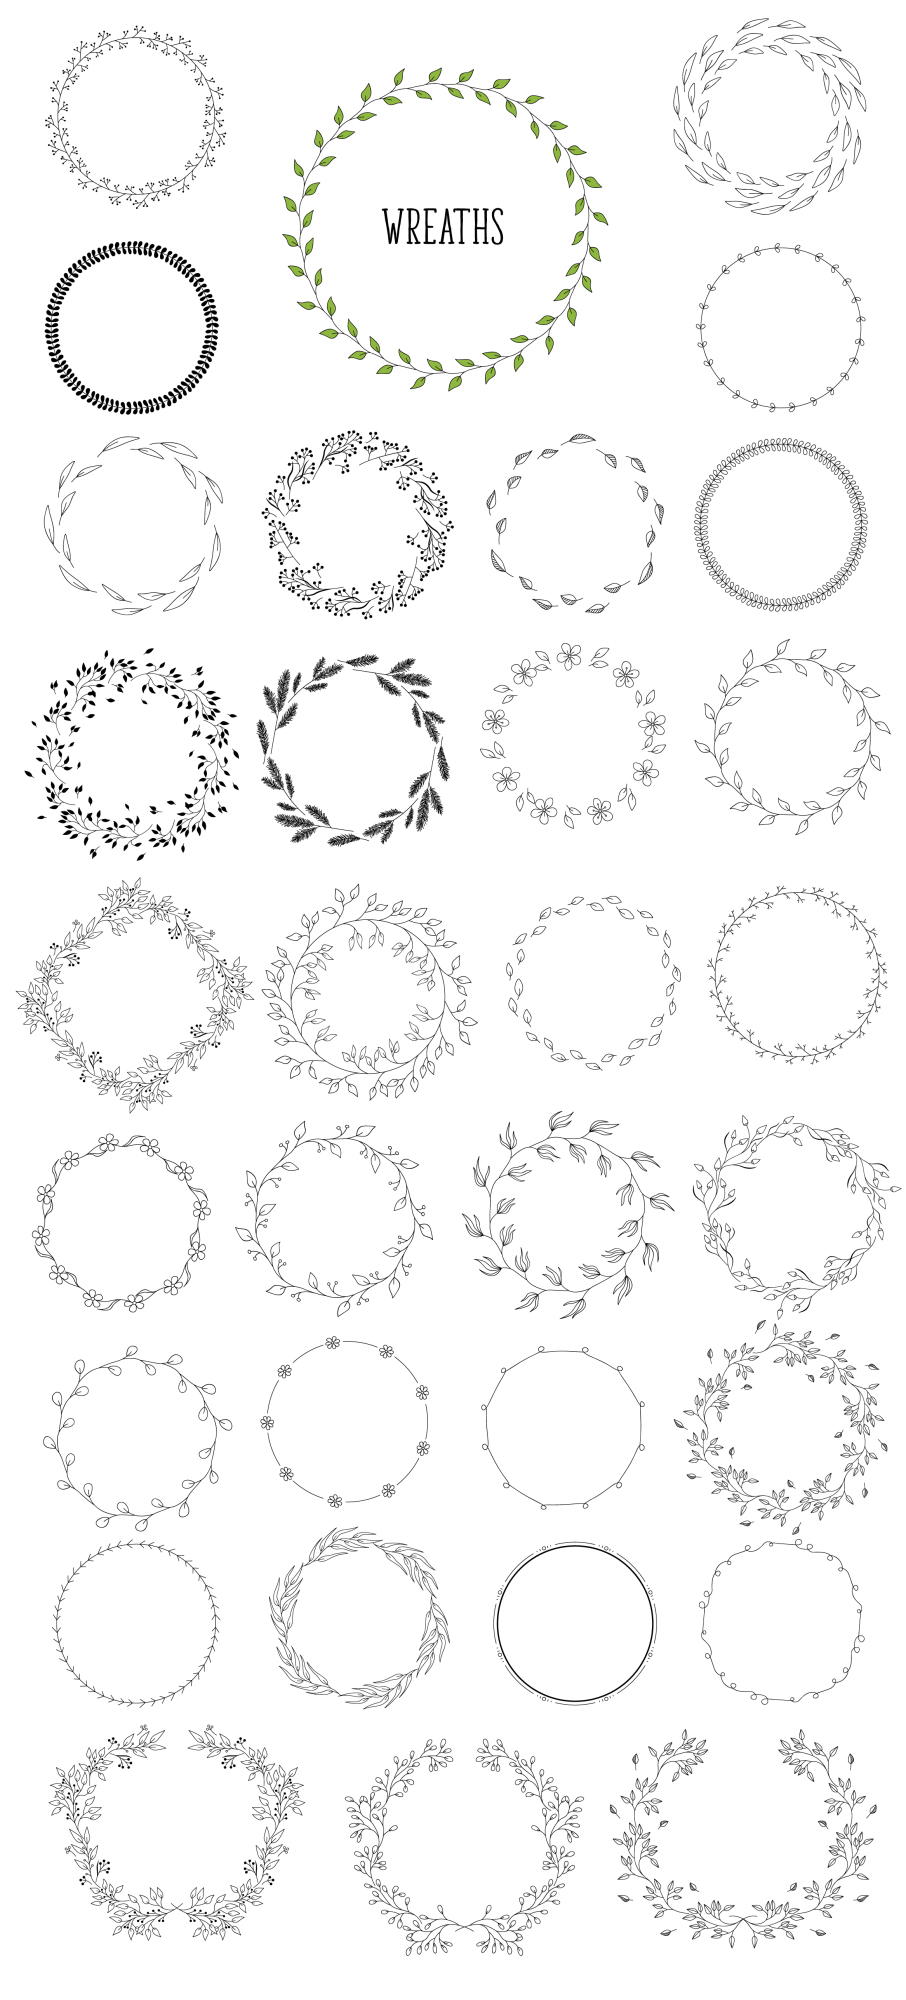 450 handsketched elements. Nature mega pack example image 6